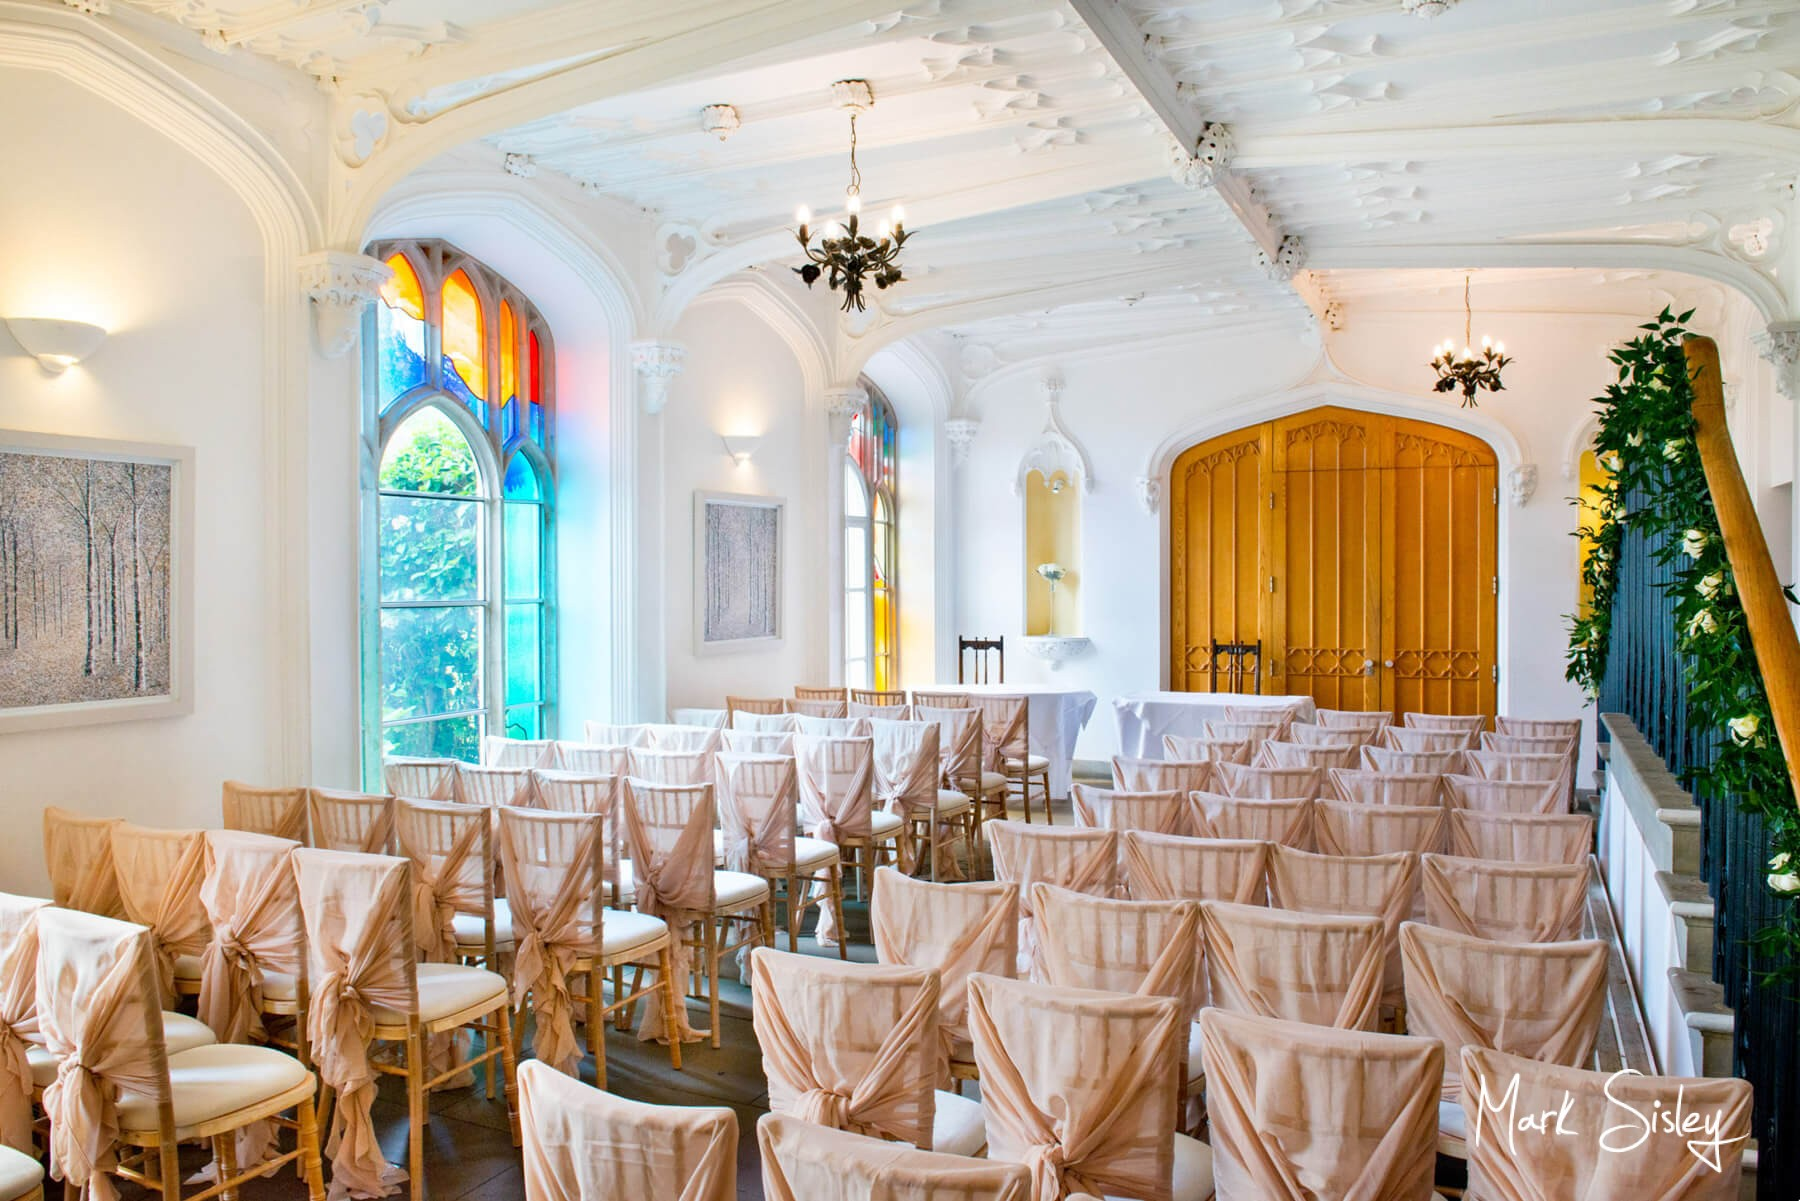 Buckinghamshire Wedding Photography - Missenden Abbey wedding ceremony